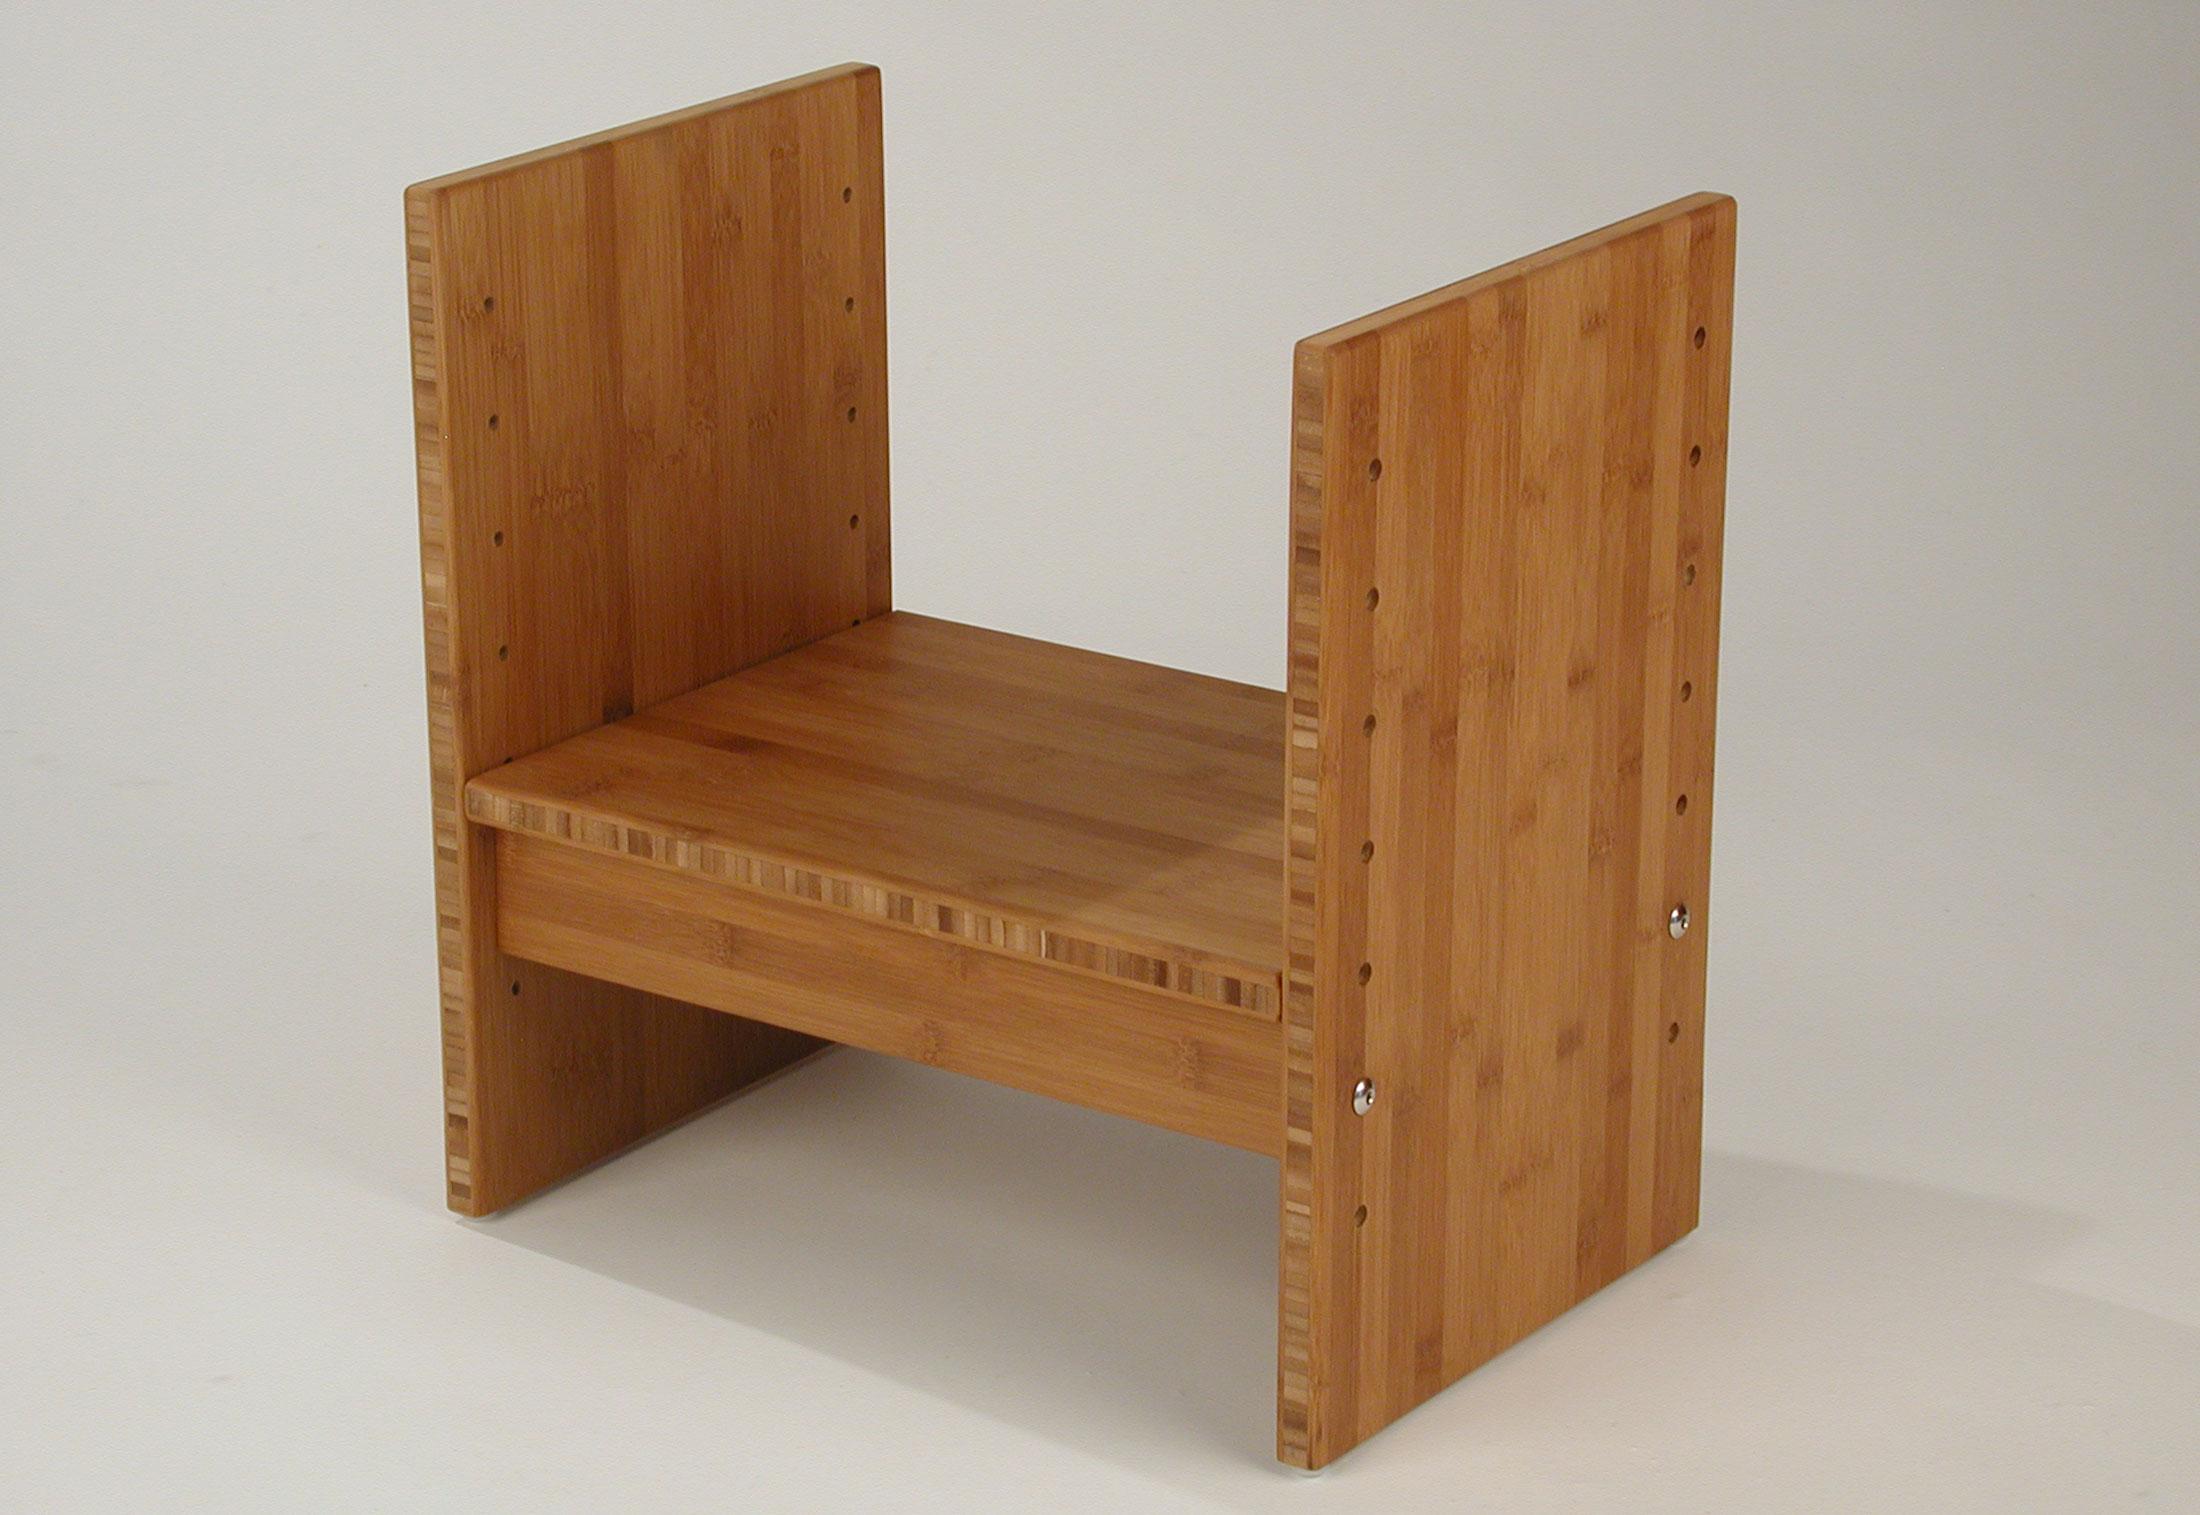 moebel fuer 39 s leben von gesellschaft fuer bessere moebel stylepark. Black Bedroom Furniture Sets. Home Design Ideas